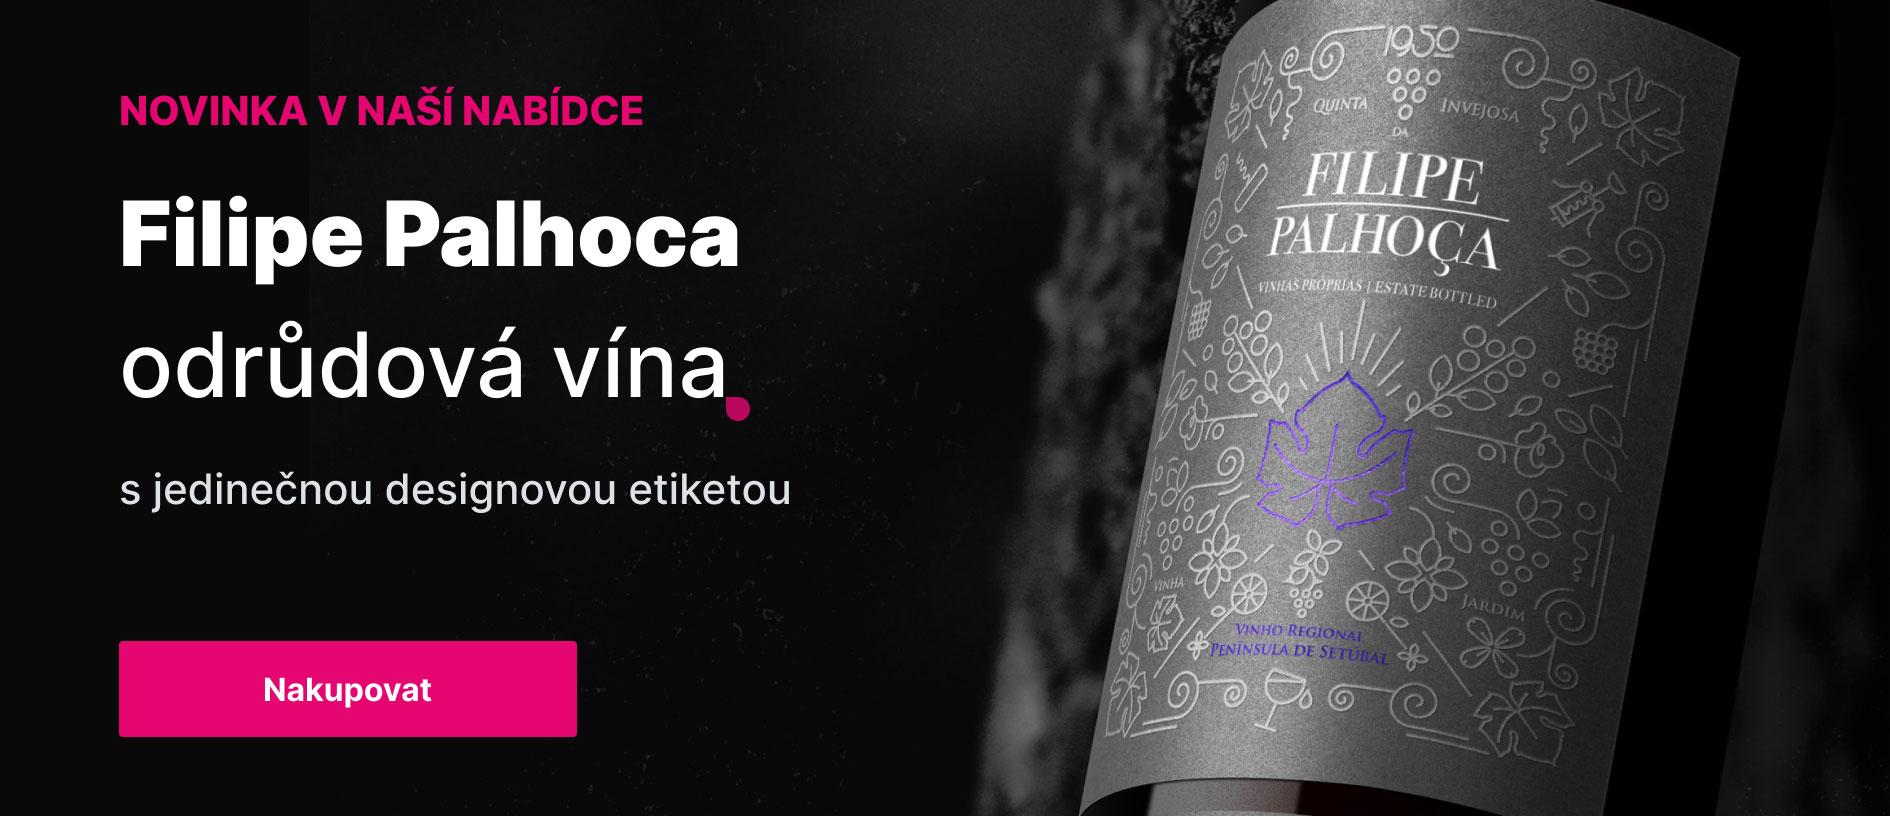 Filipe Palhoca odrůdová vína